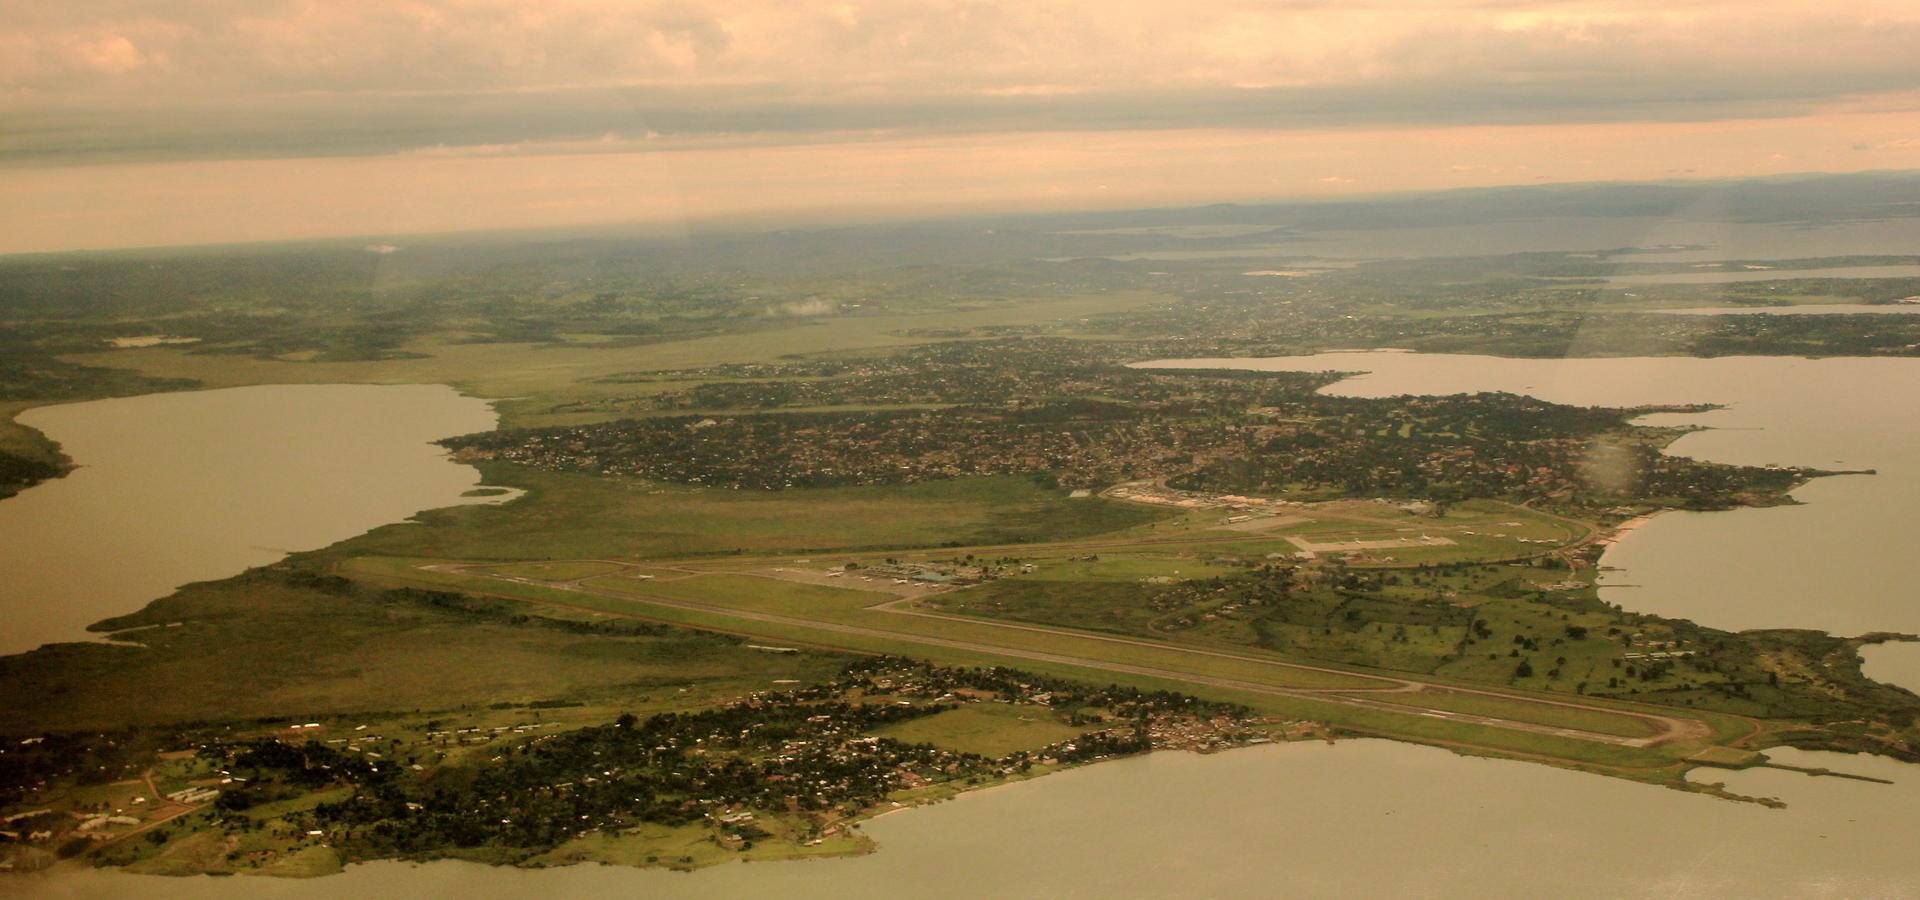 Peer-to-peer advisory in Entebbe, Wakiso District, The Central Region, Uganda